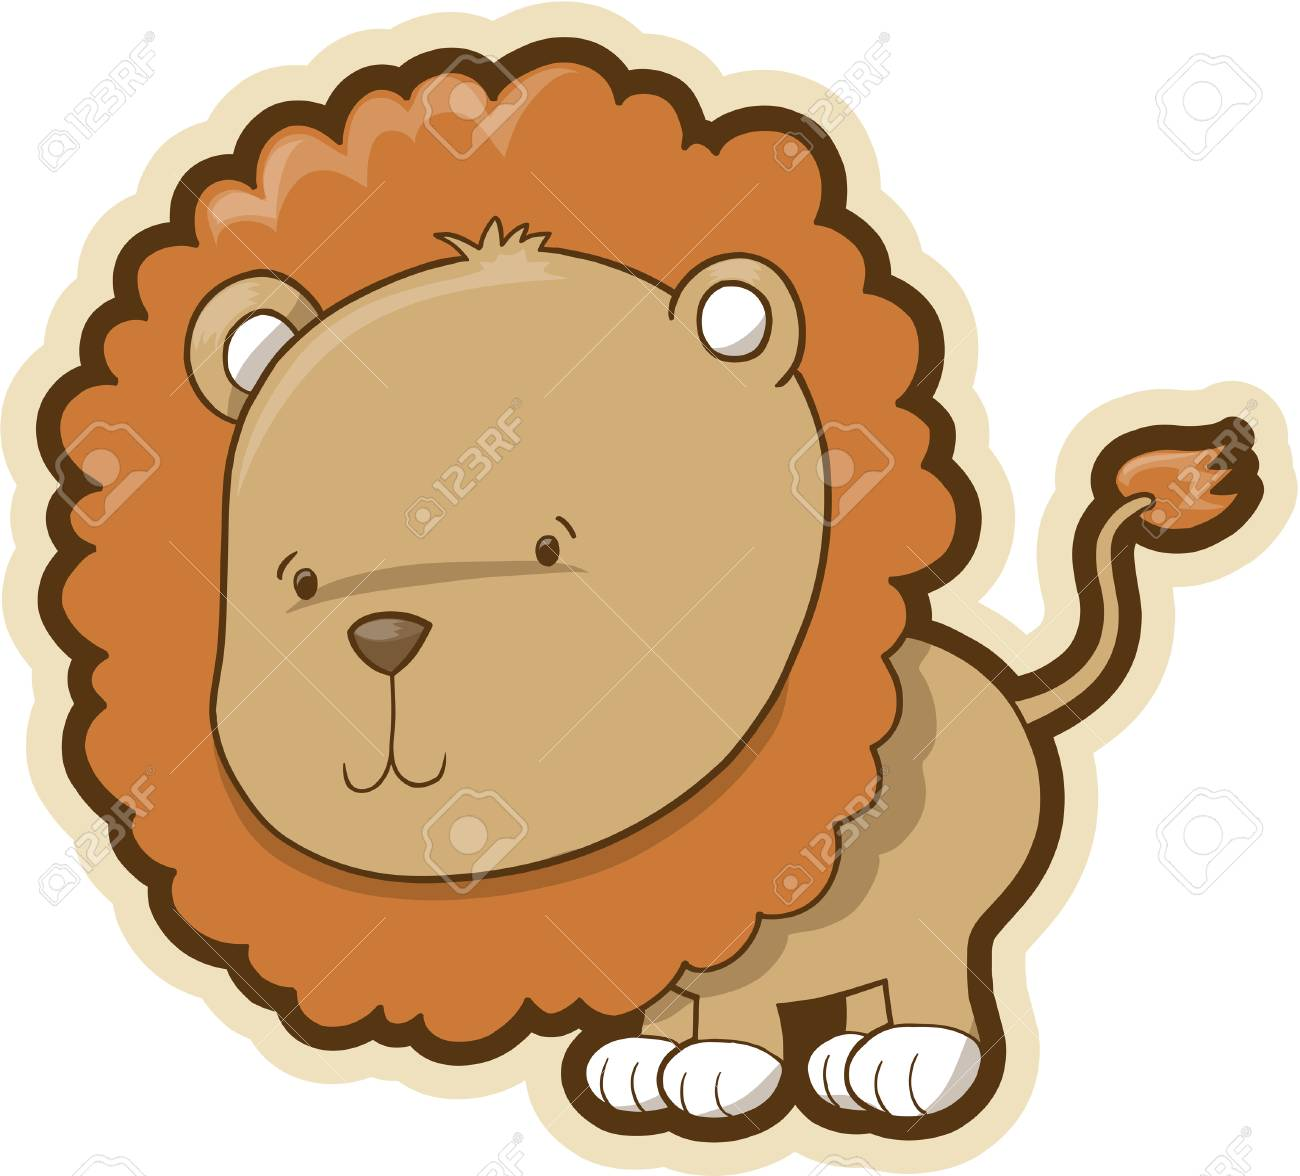 Cute Safari Lion Vector Illustration Stock Vector - 3050809